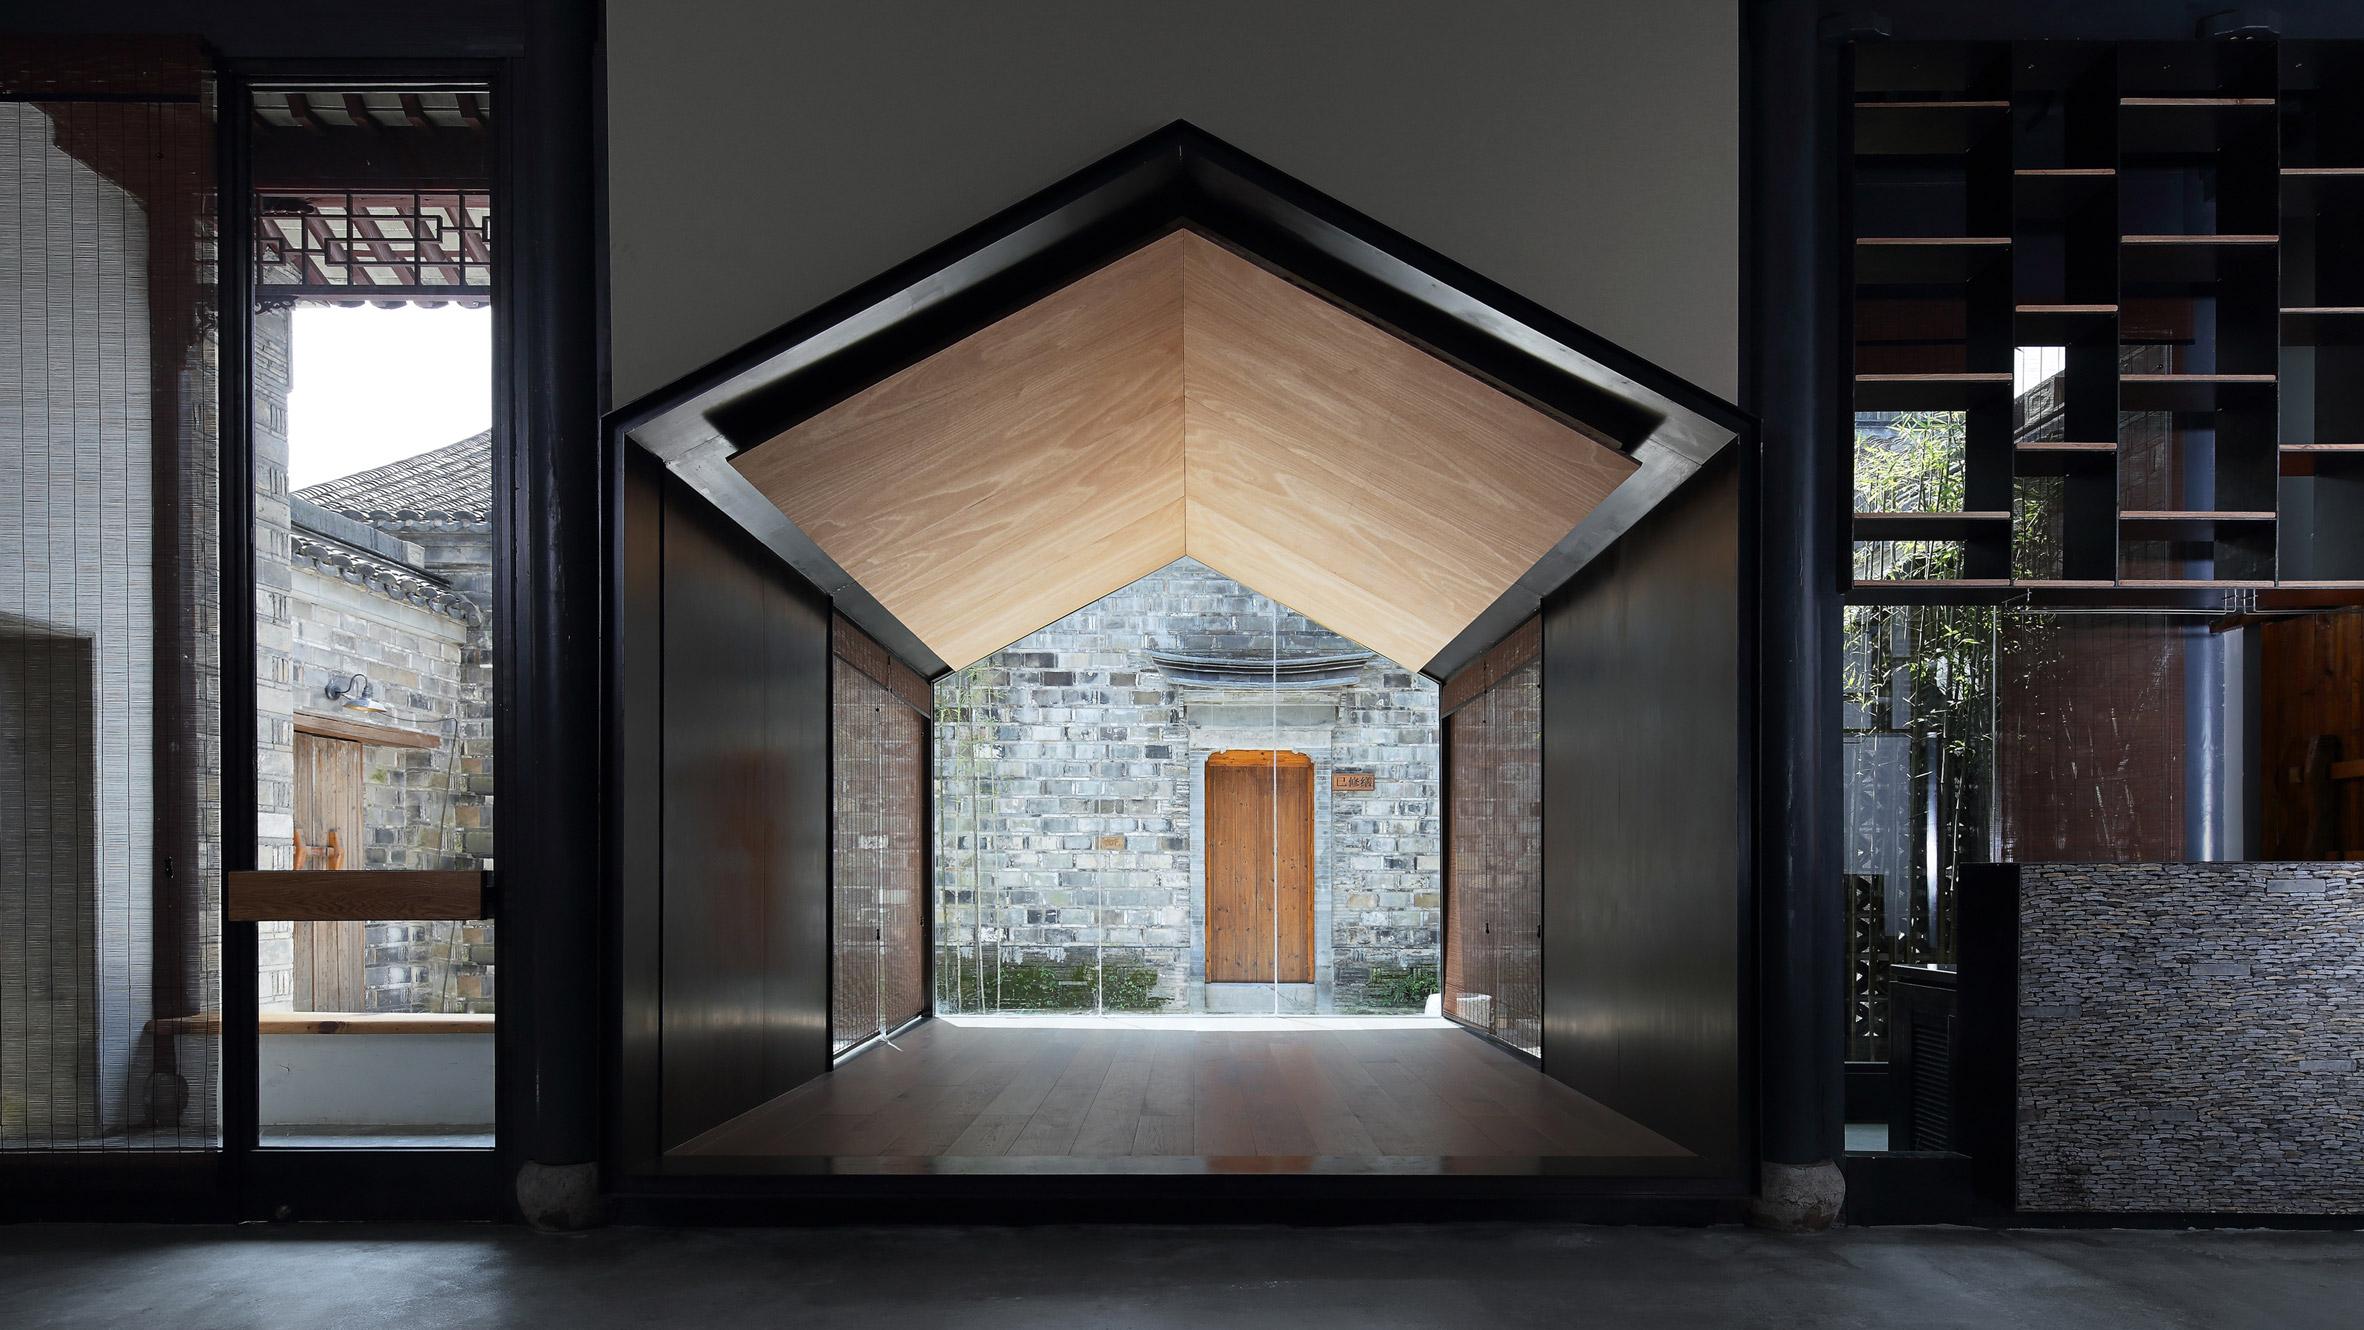 Glazed Meditation Room Overlooks Traditional Courtyard